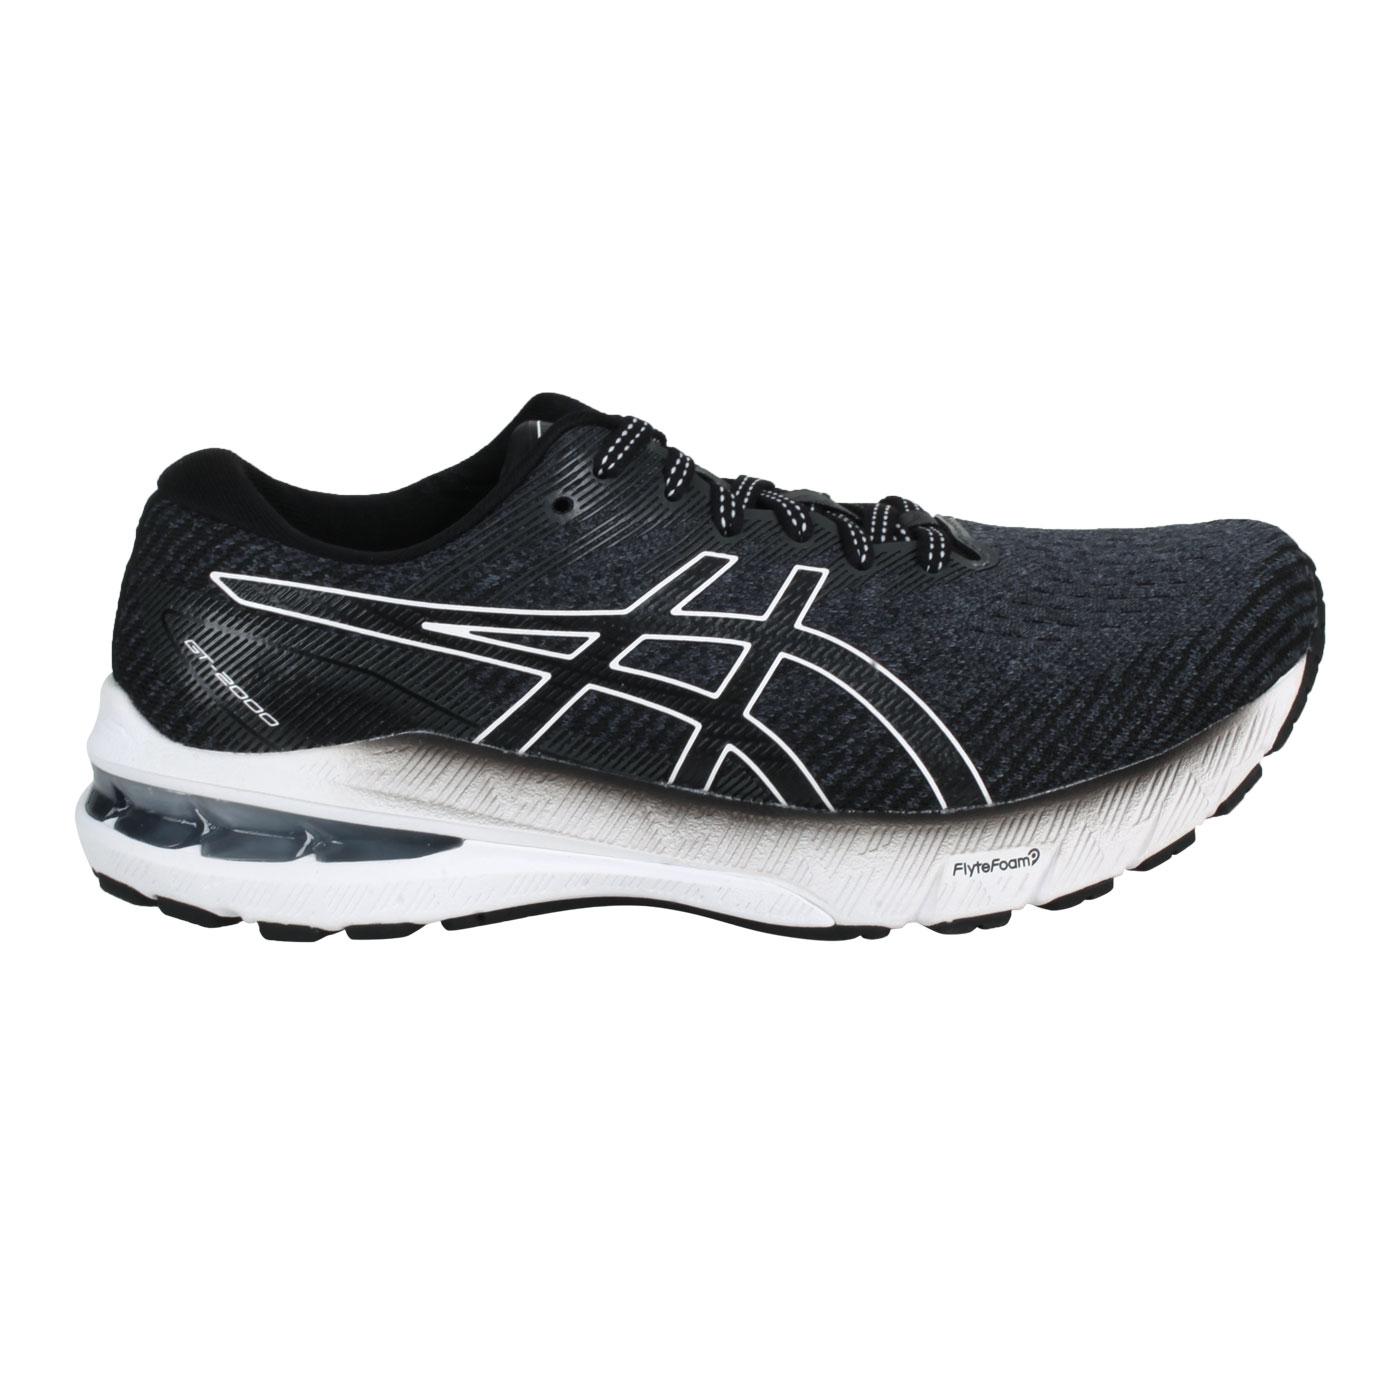 ASICS 女款慢跑鞋-2E  @GT-2000 10@1012B043-002 - 黑灰白